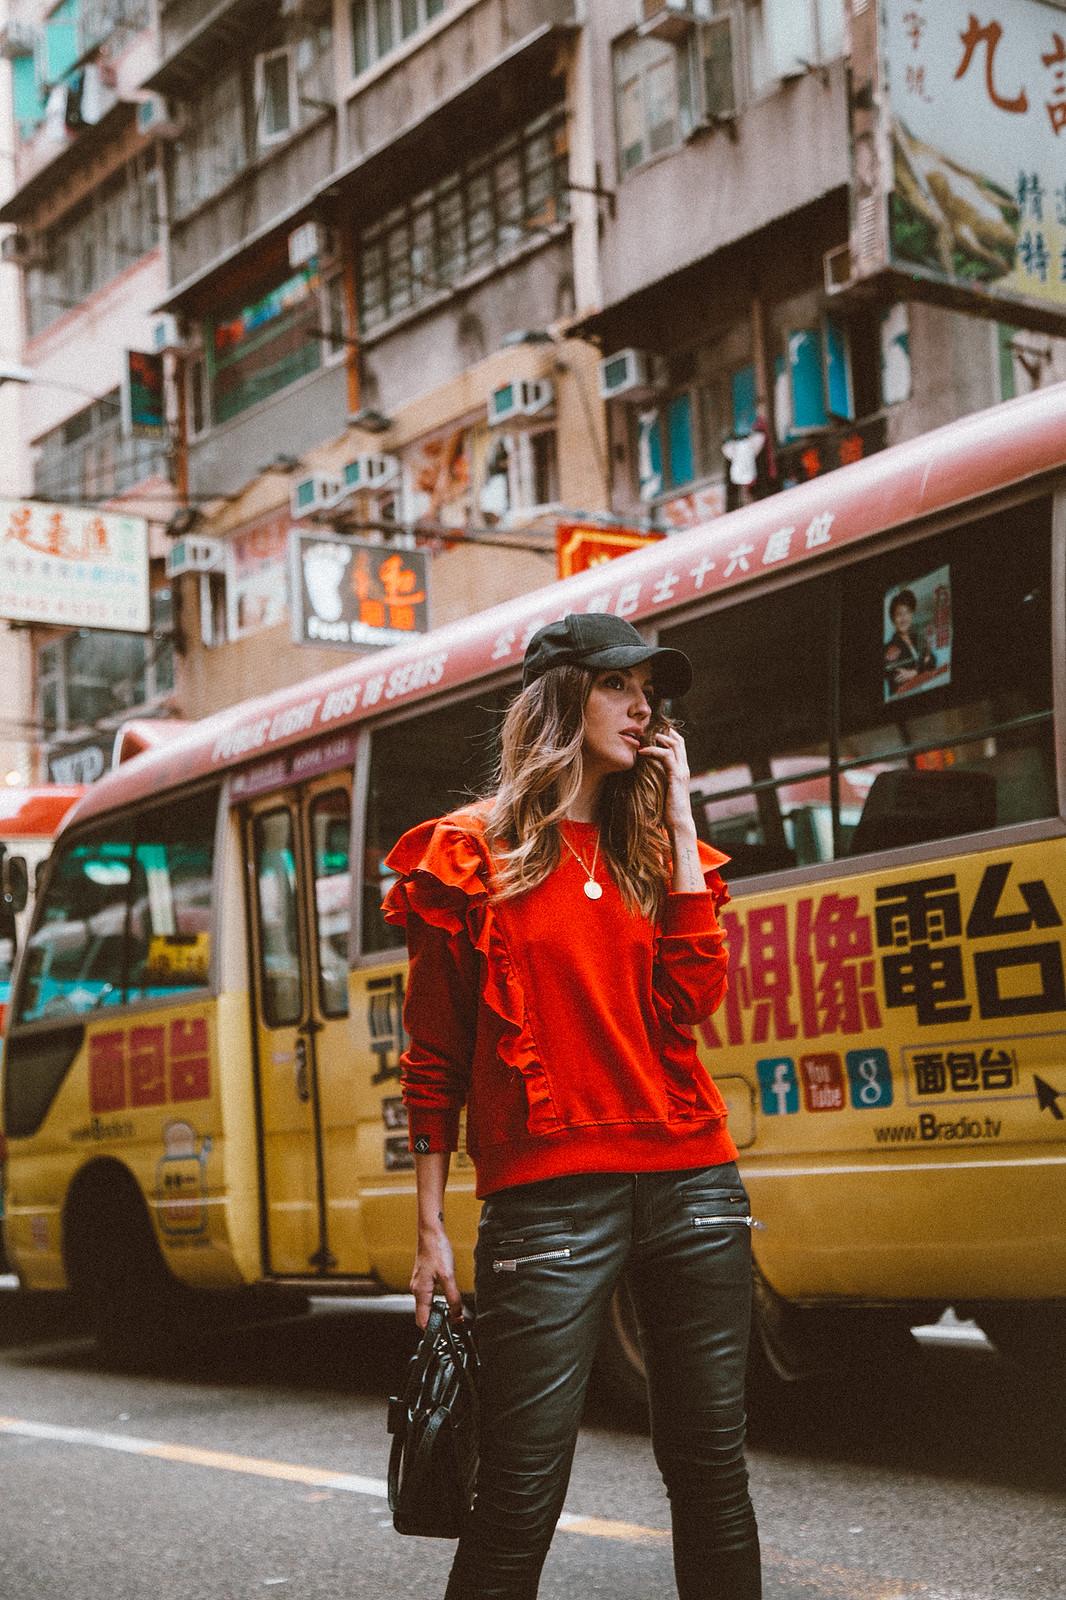 HONG KONG 3-26